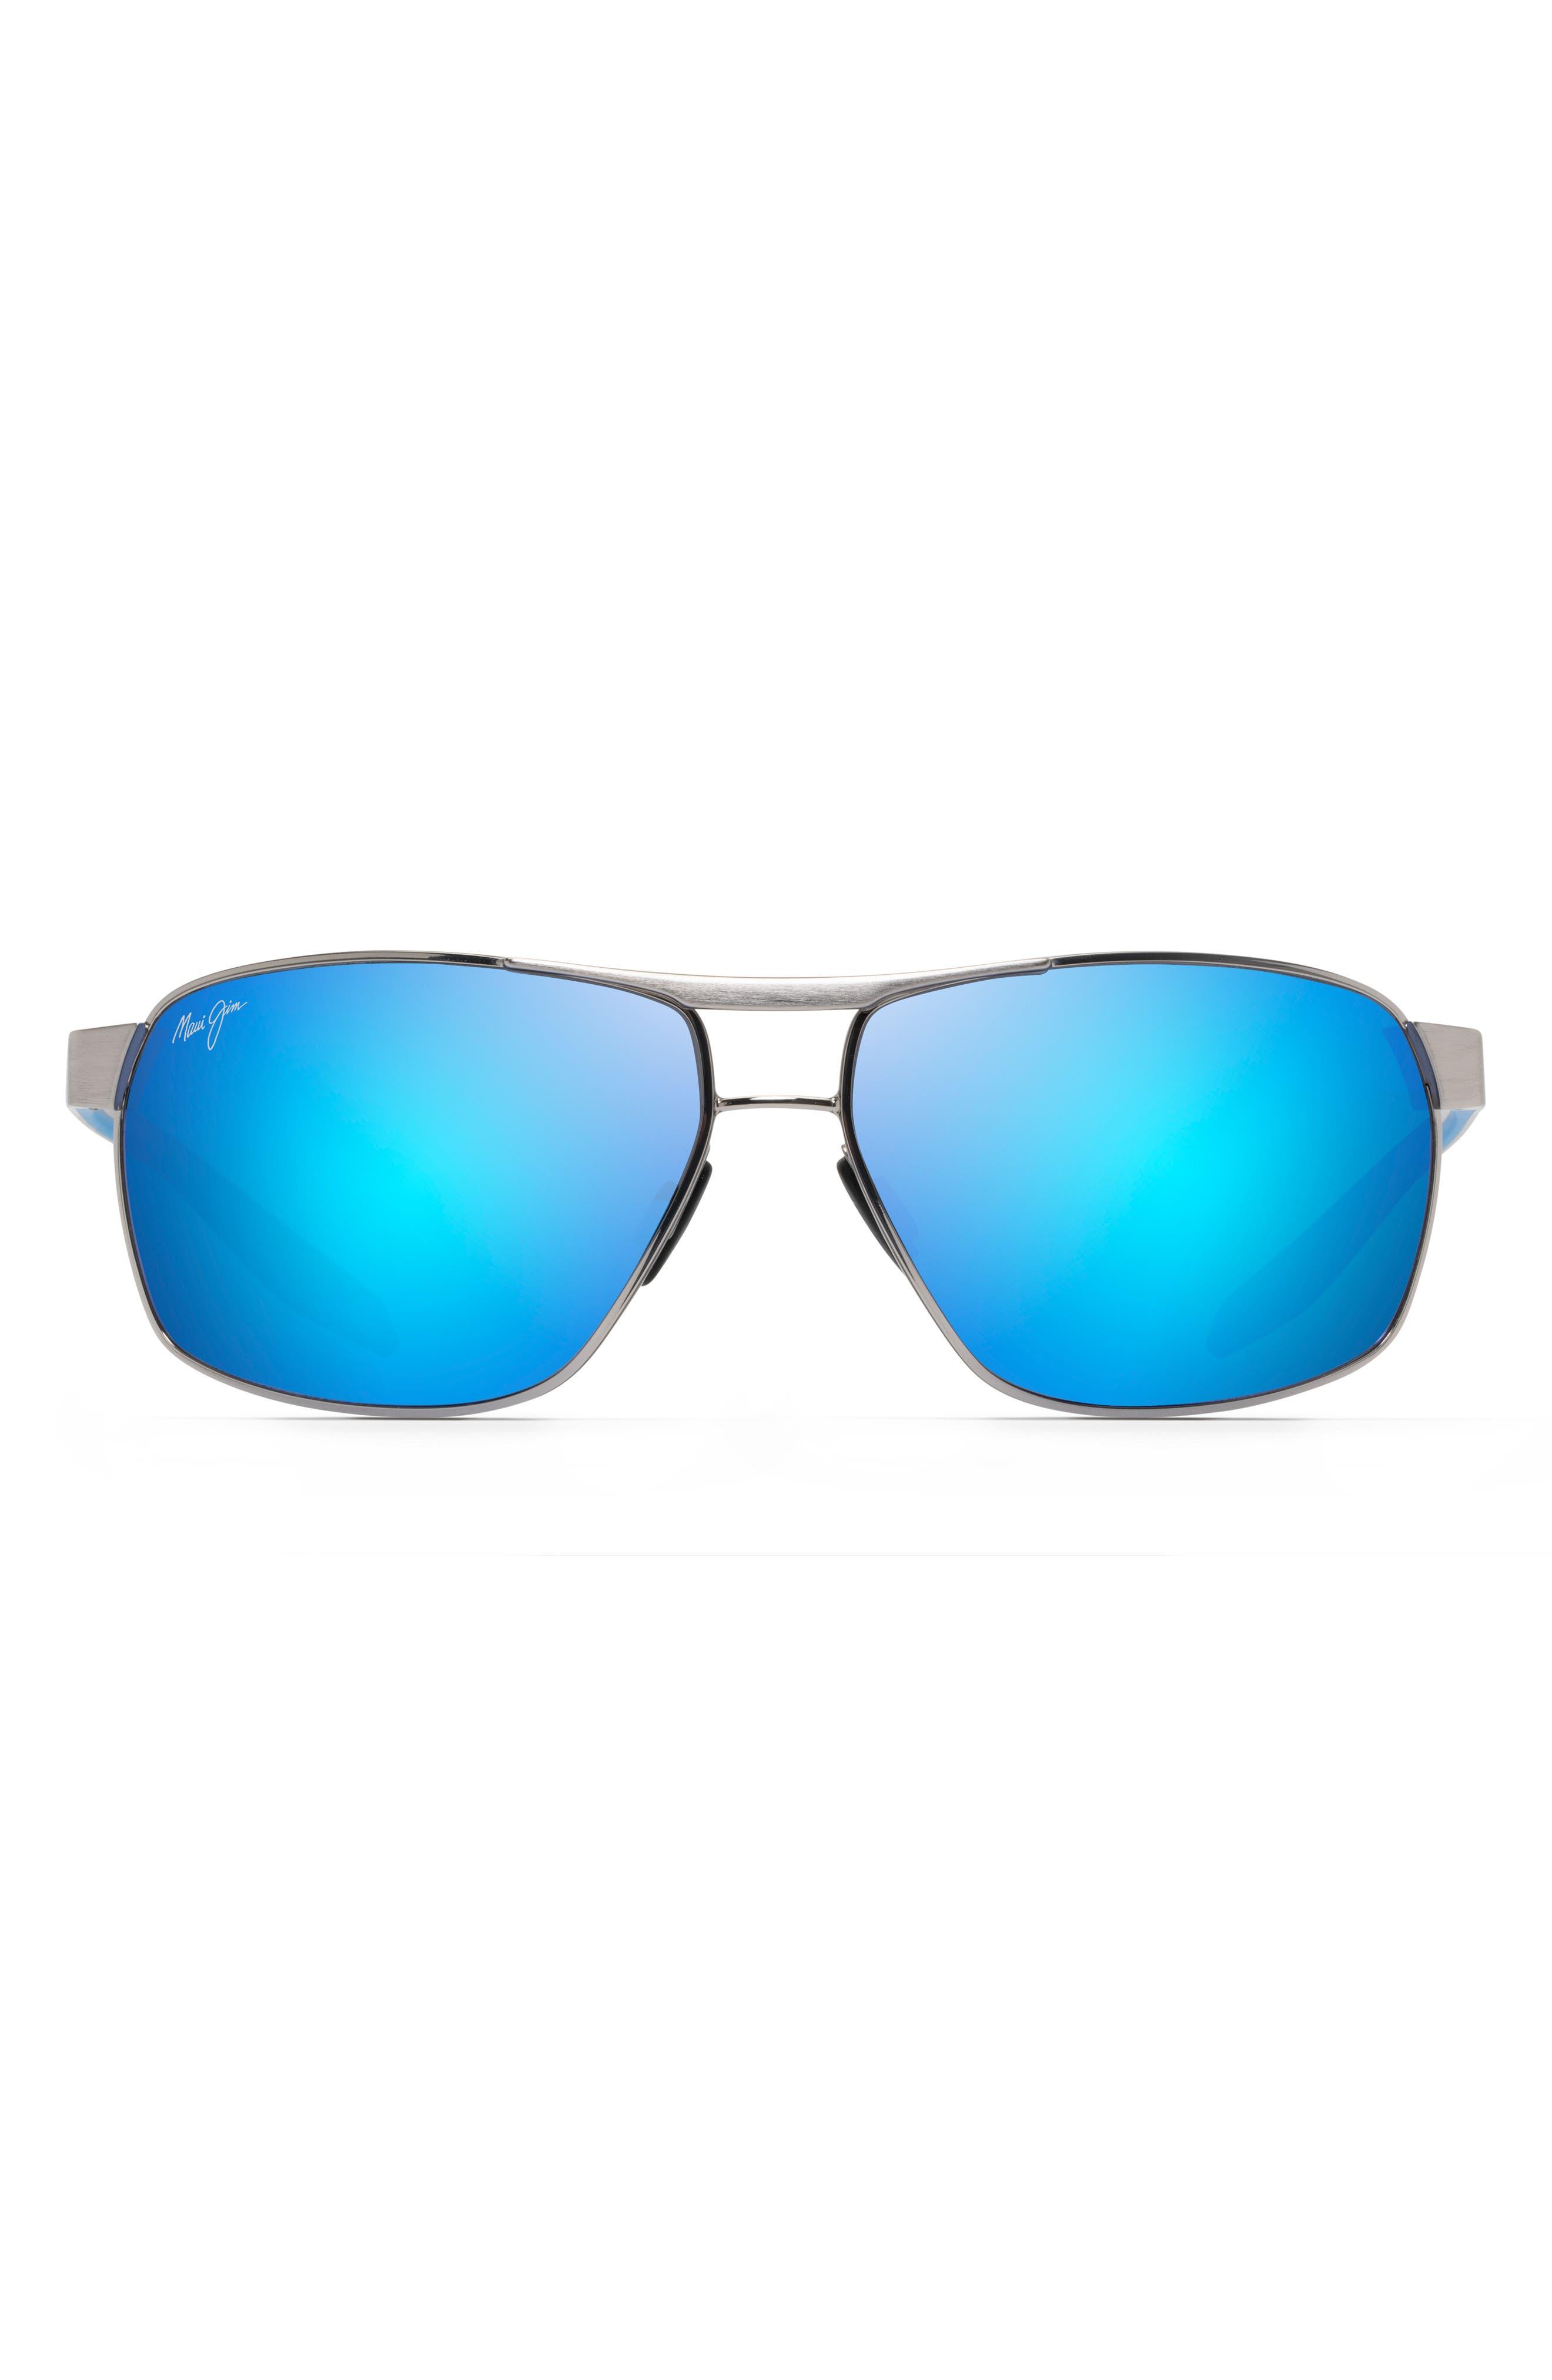 The Bird Polarizedplus2 63mm Rectangle Sunglasses